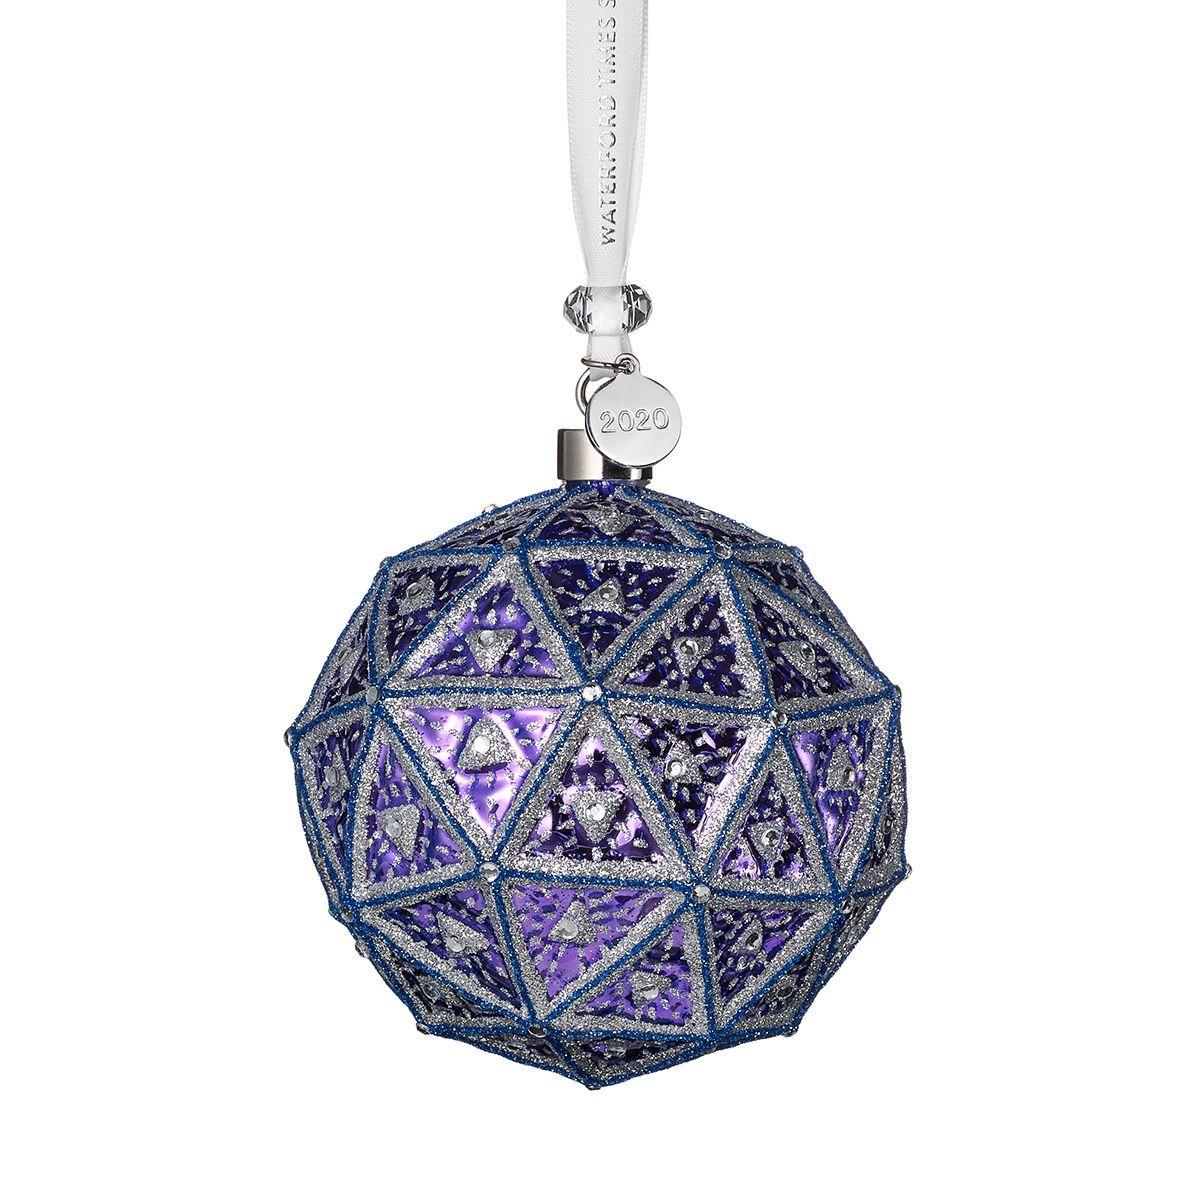 2020 Times Square Small Replica Ball Ornament How to